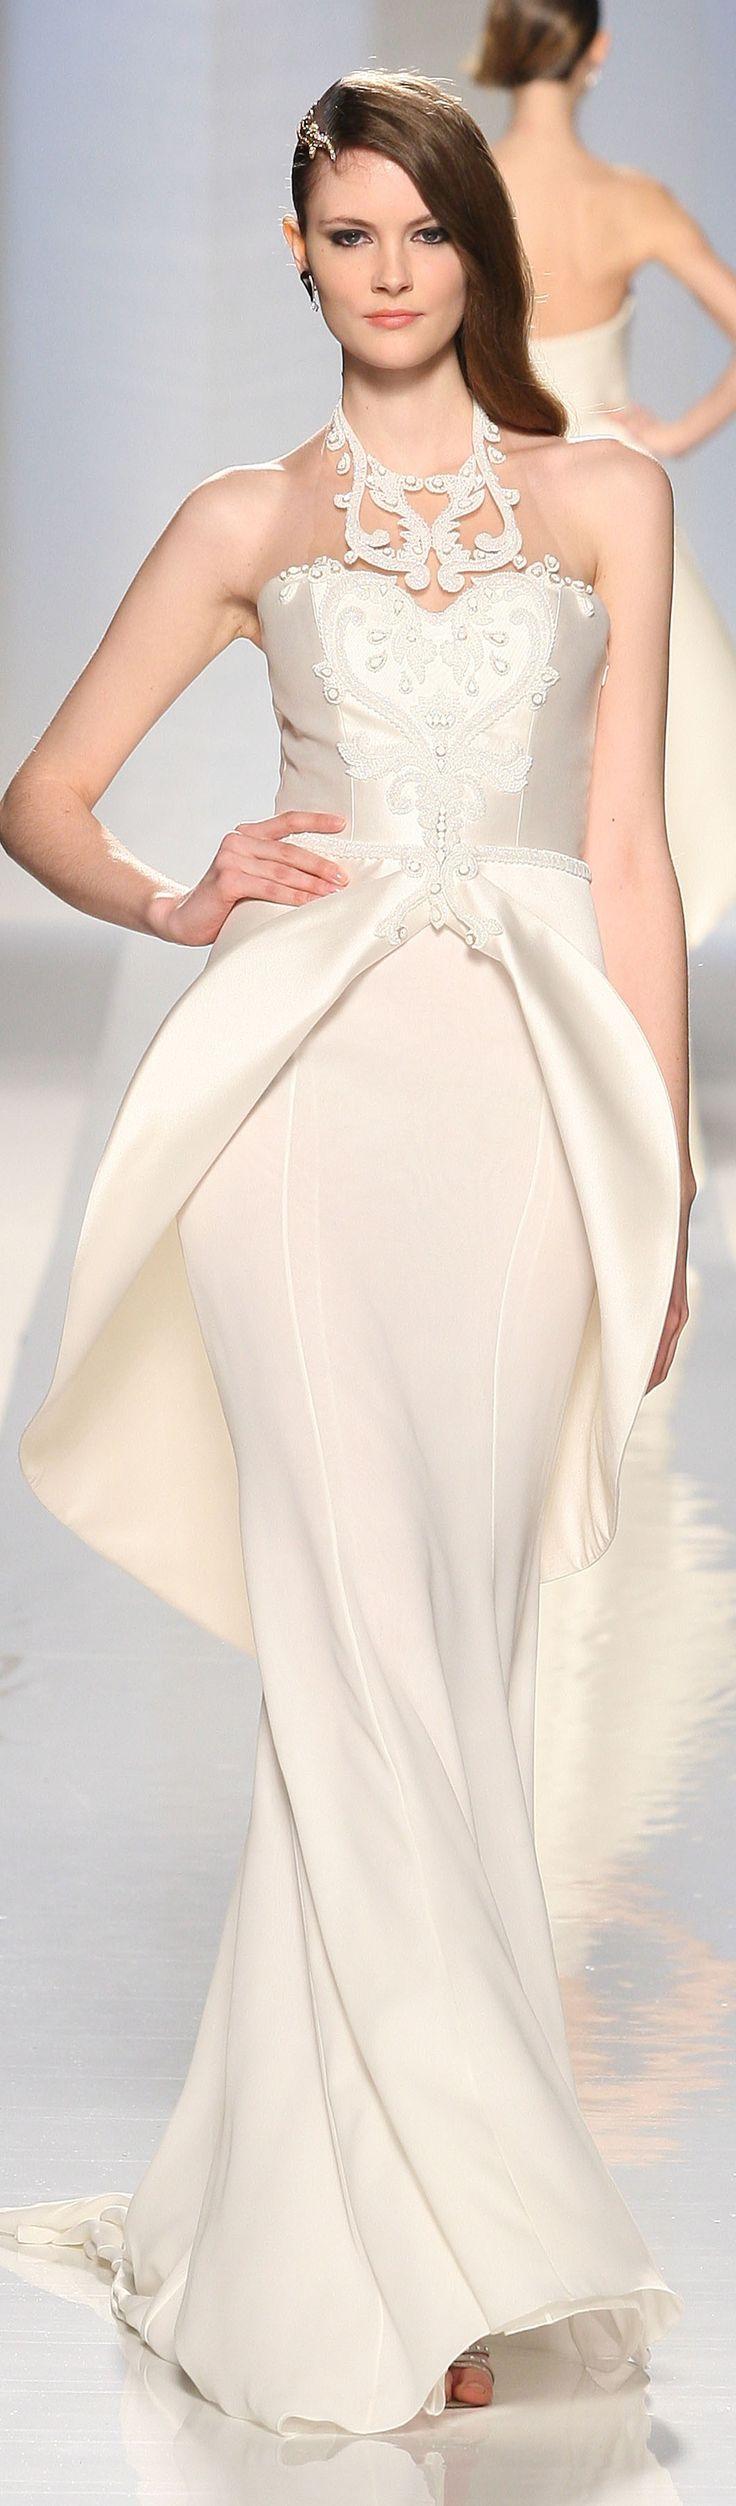 Dress - Fausto Sarli Haute Couture ~ #2070130 - Weddbook